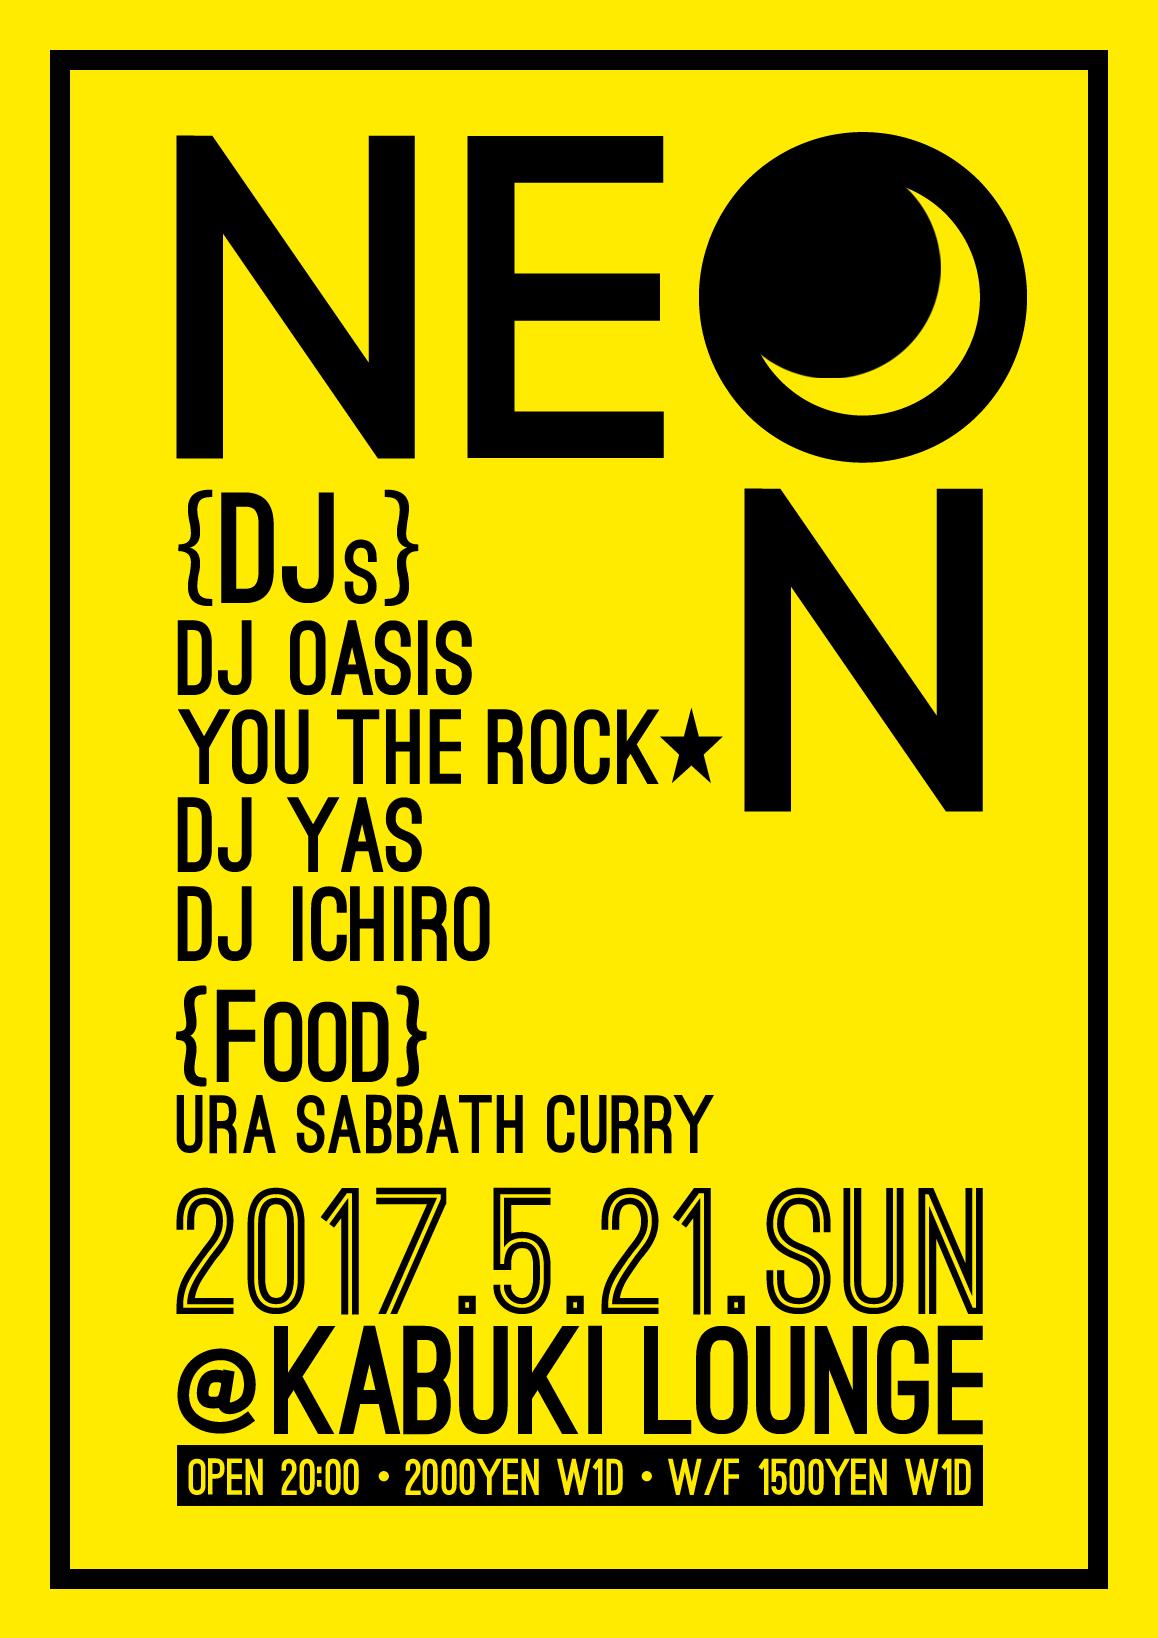 neon0521_2